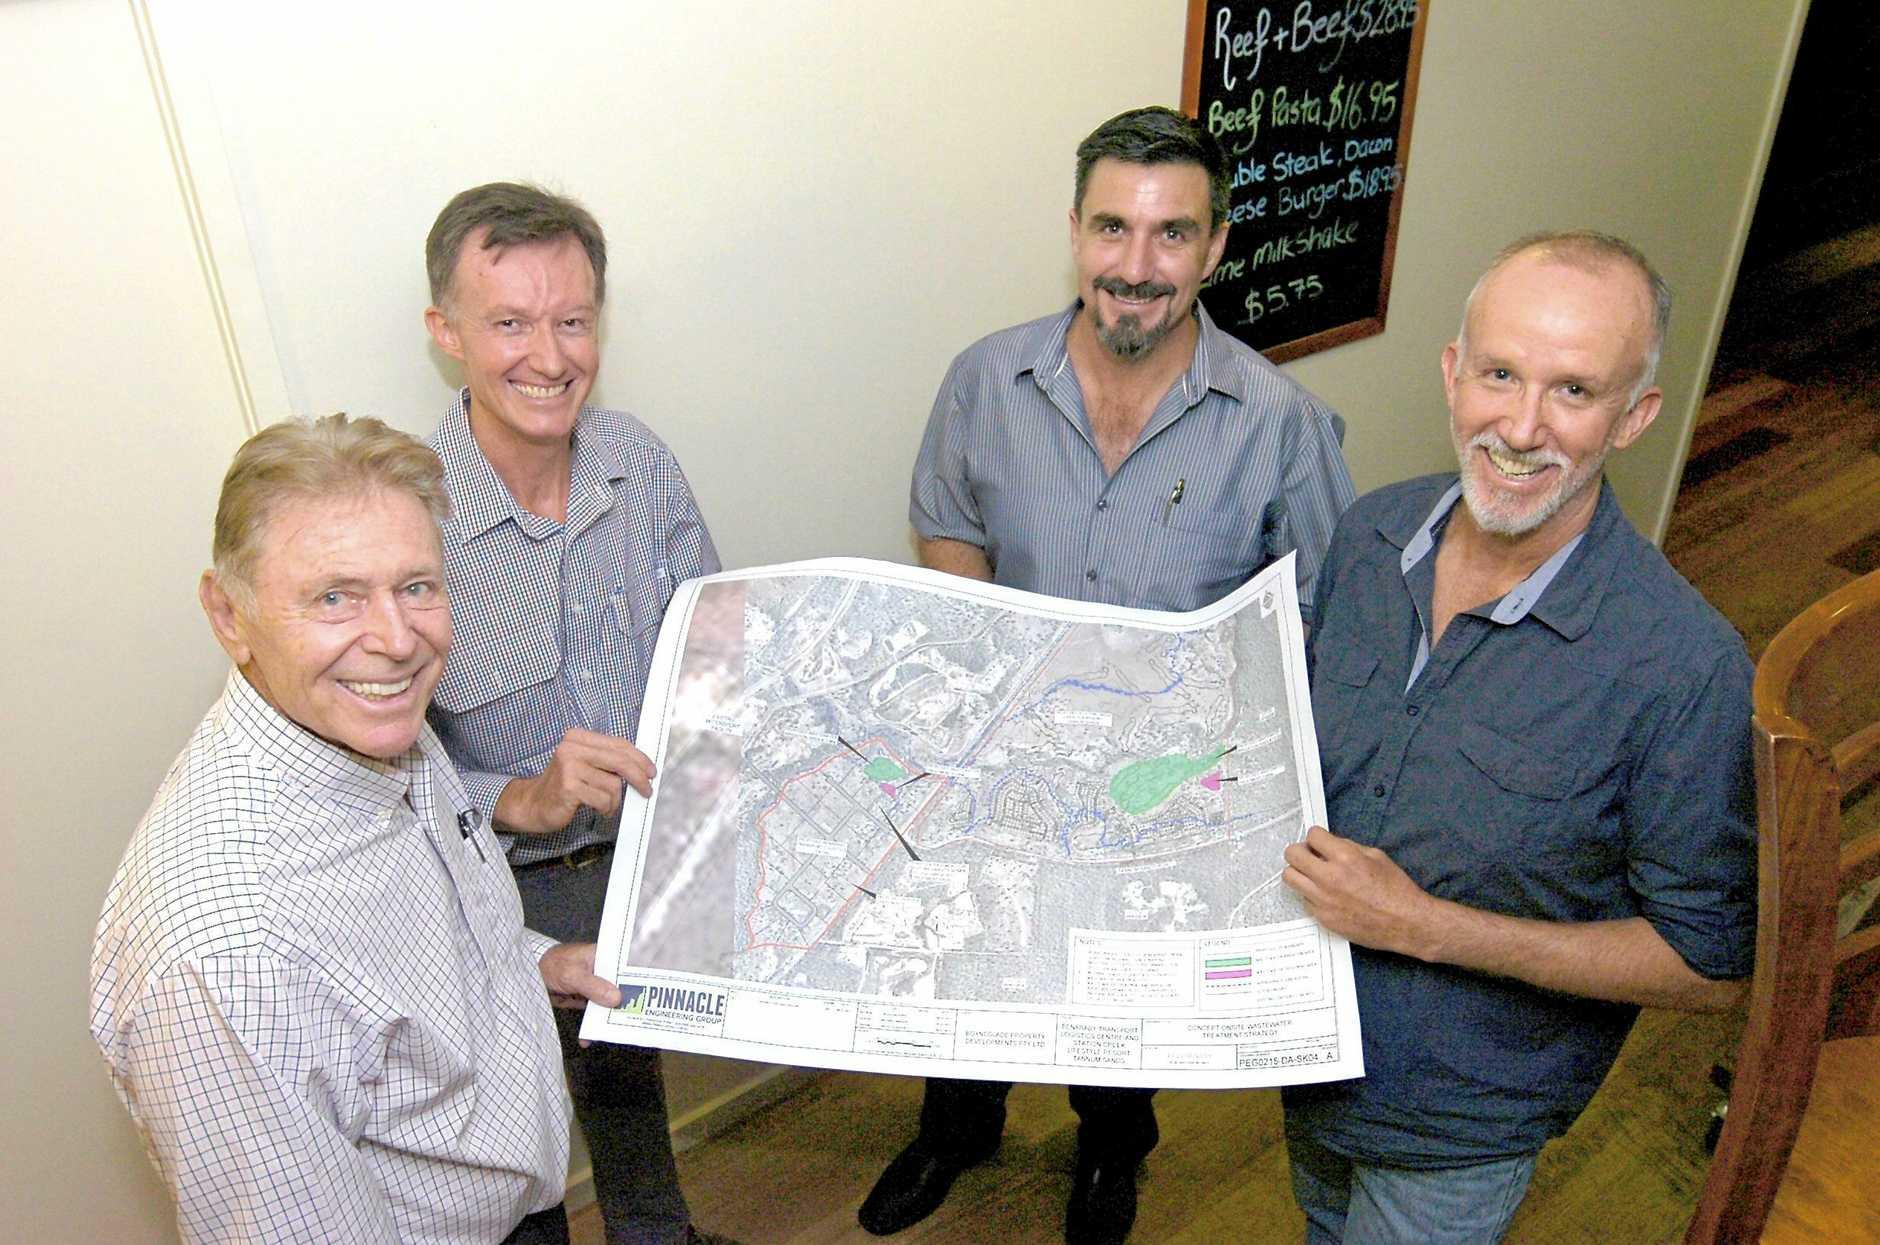 Graham Marsh, Jonathan Mann, Jason Sullivan and Michael Mann with plans for the Station Creek Lifestyle RV Home Park and Resort.